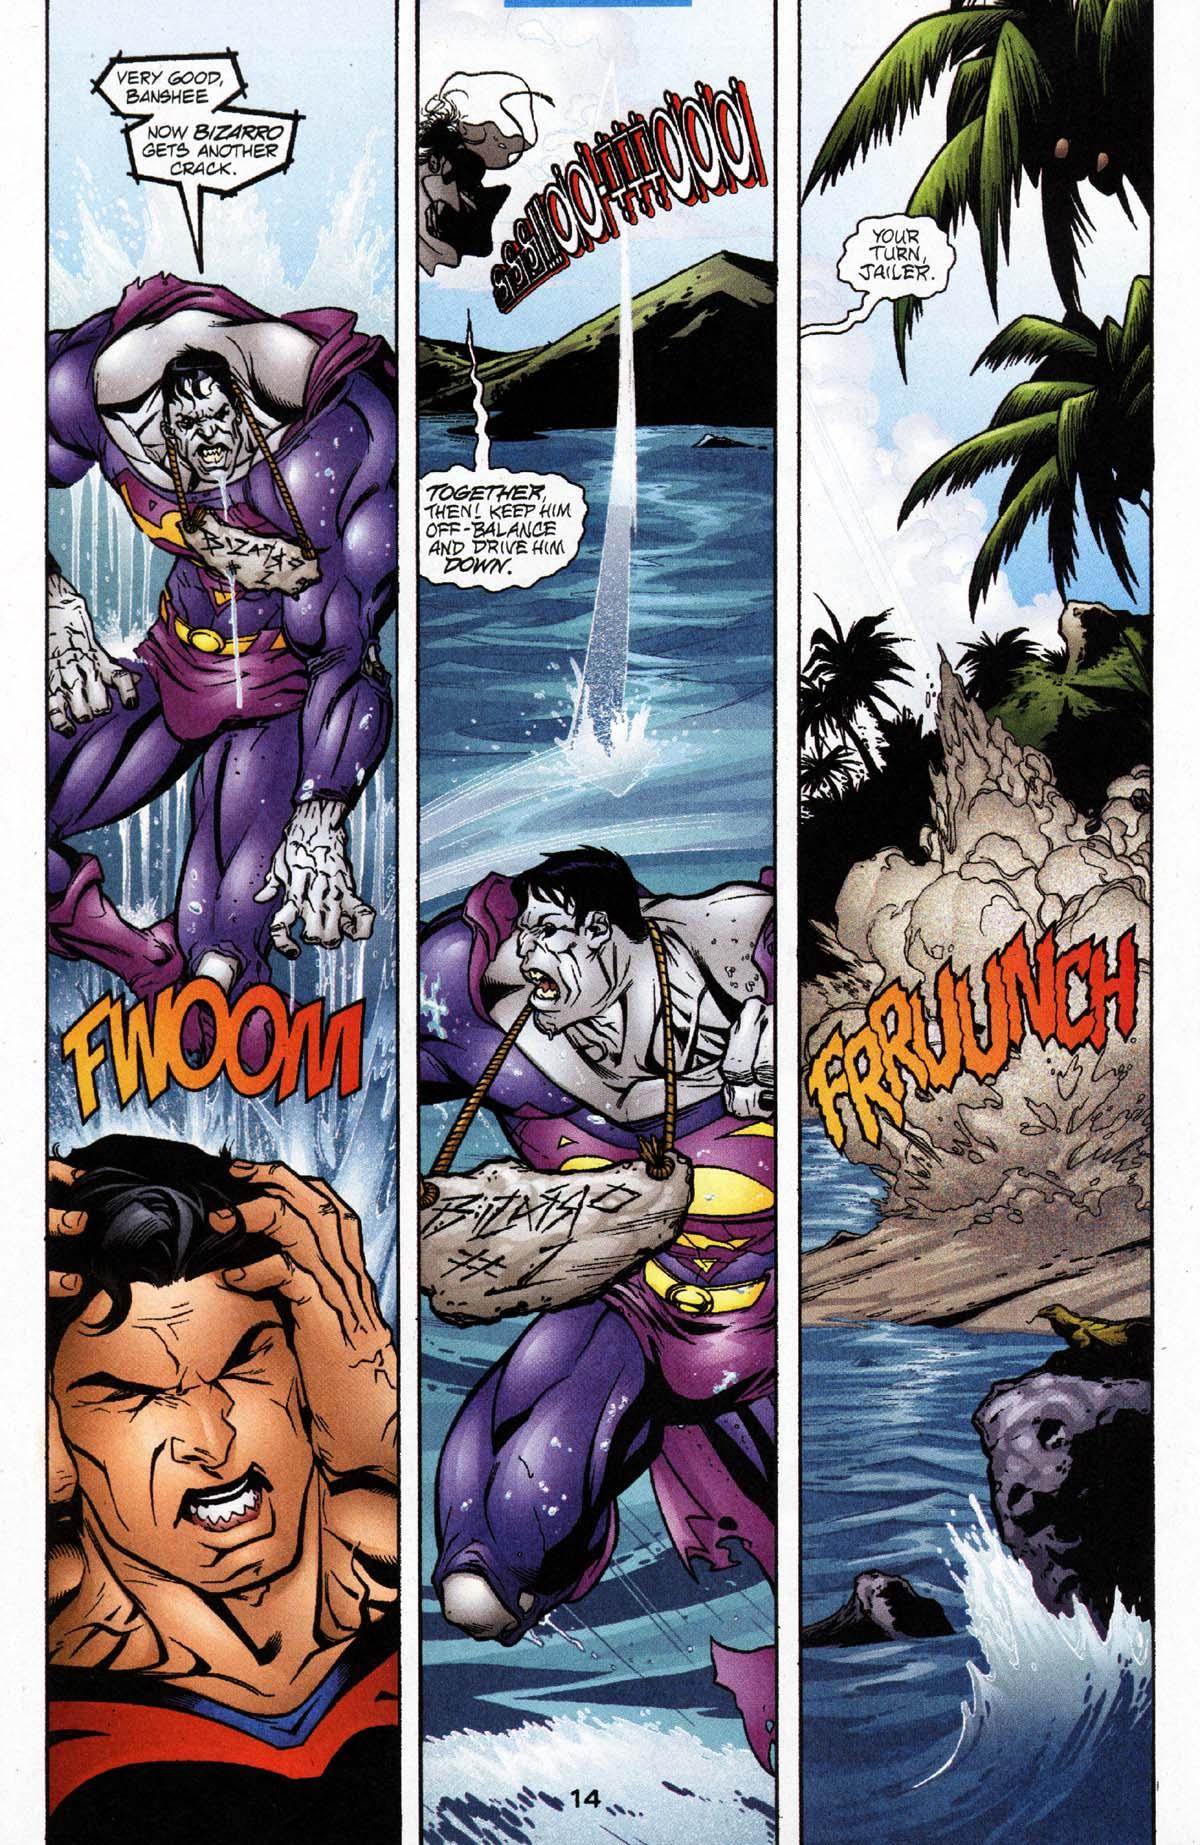 Superman the Man of Steel 1991 series # 72 very fine comic book